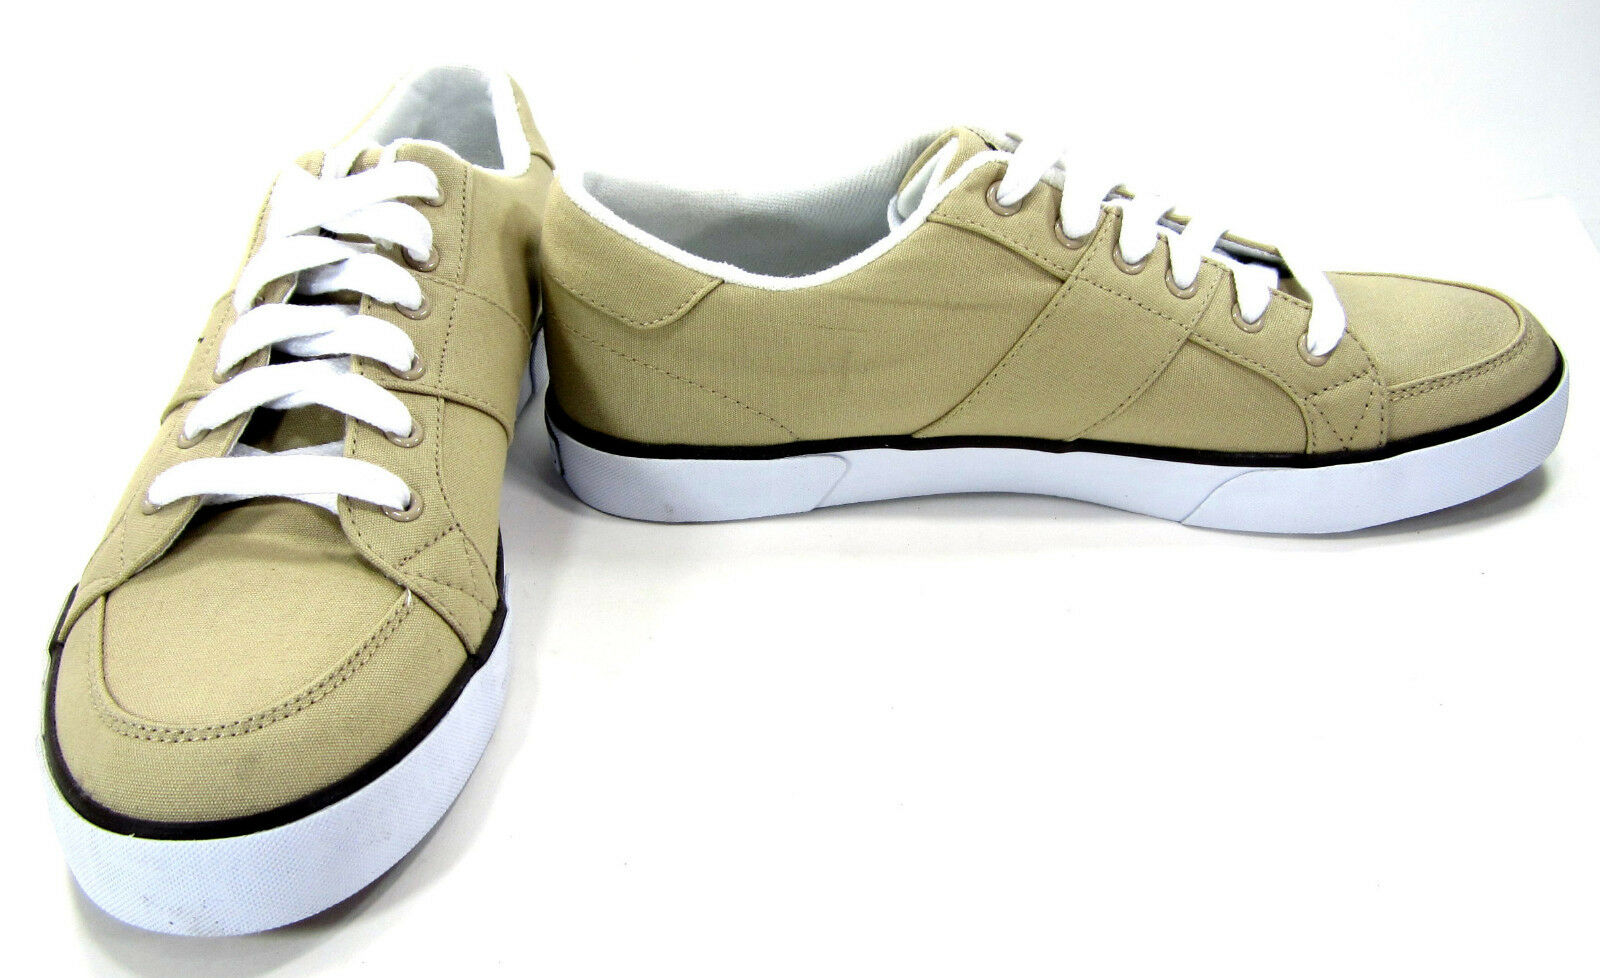 Polo Ralph Lauren shoes Harold Canvas Khaki Tan Sneakers Size 12